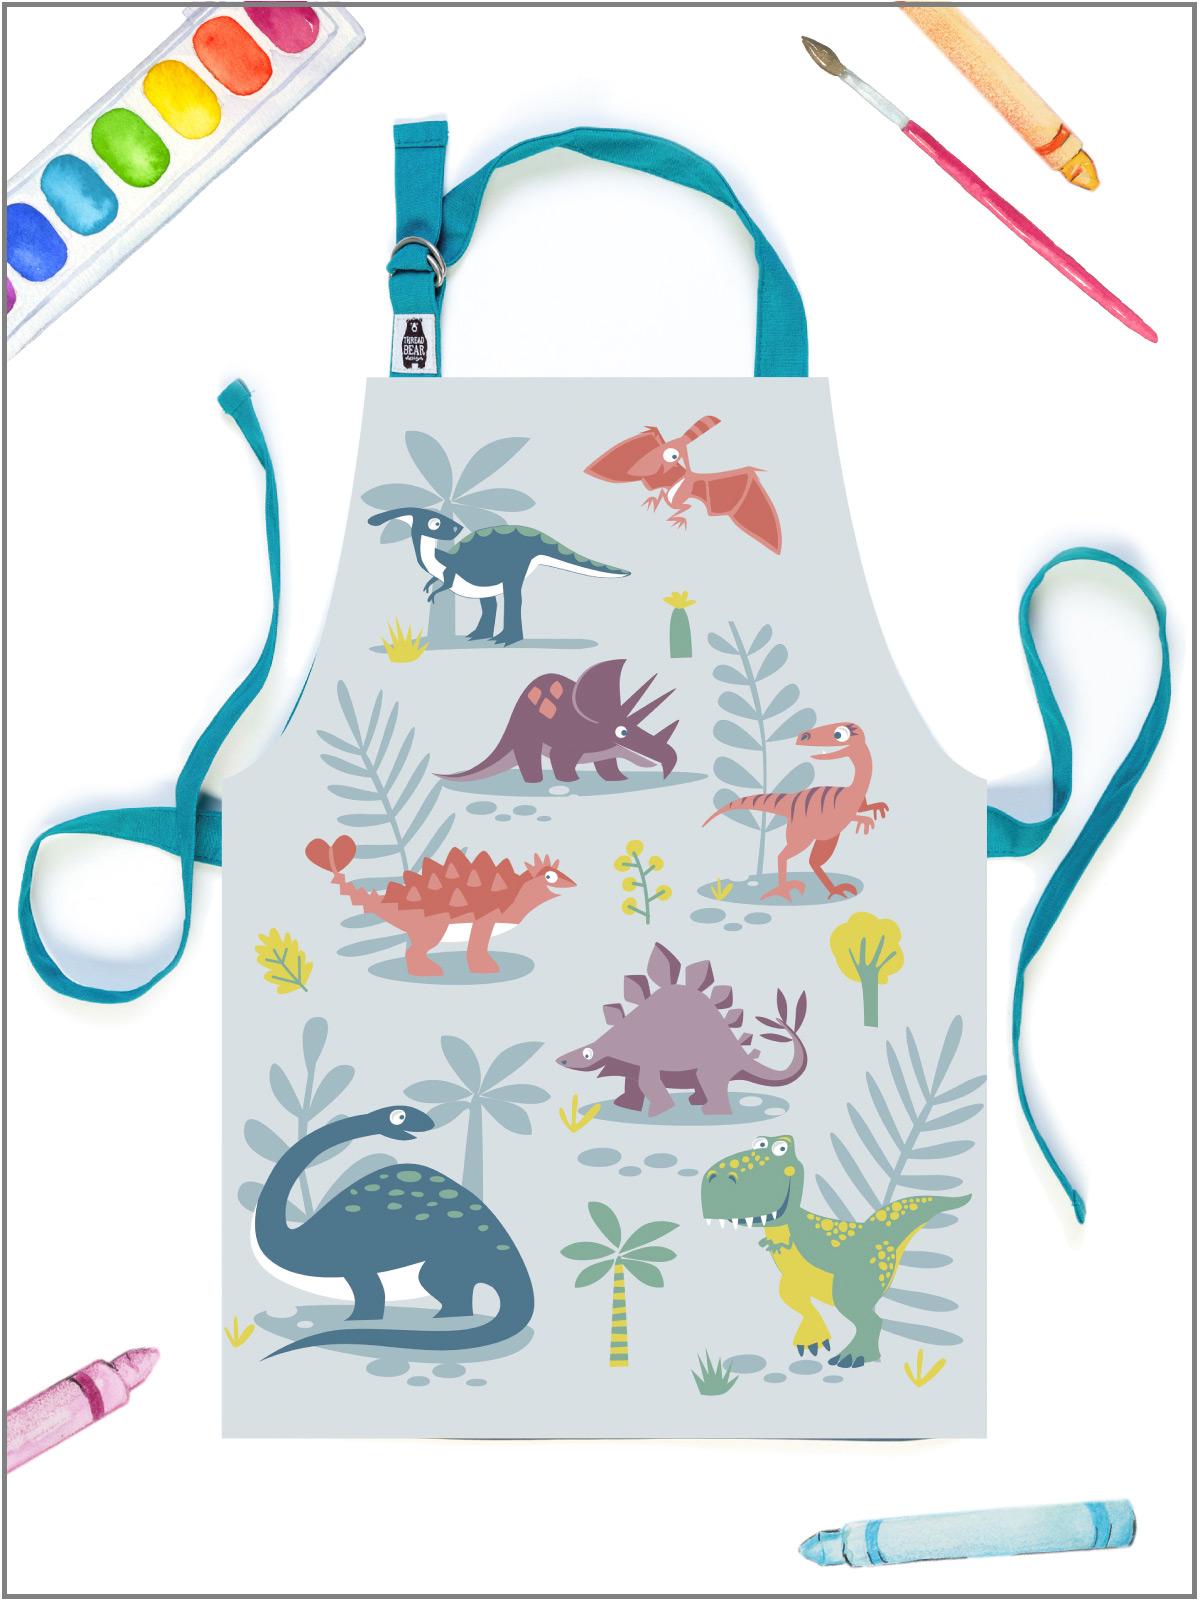 frederickandsophie-kids-toys-threadbear_design-apron-dinosaurs-art-crafts-artist-play